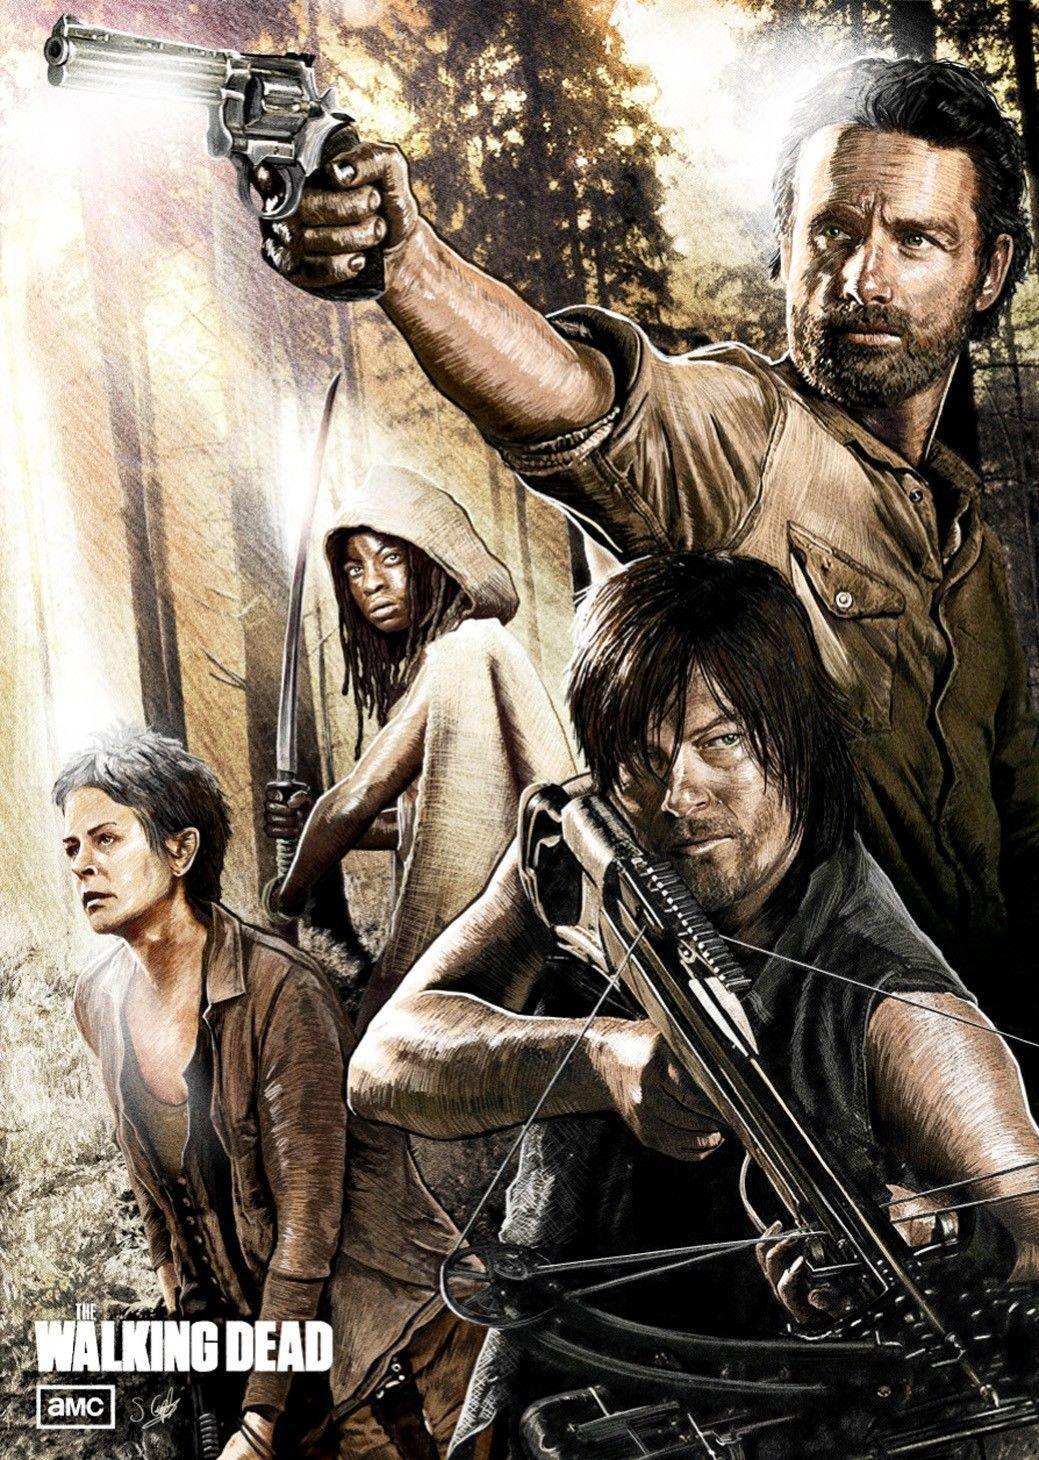 The Walking Dead Art Wall Print POSTER Decor 32x24